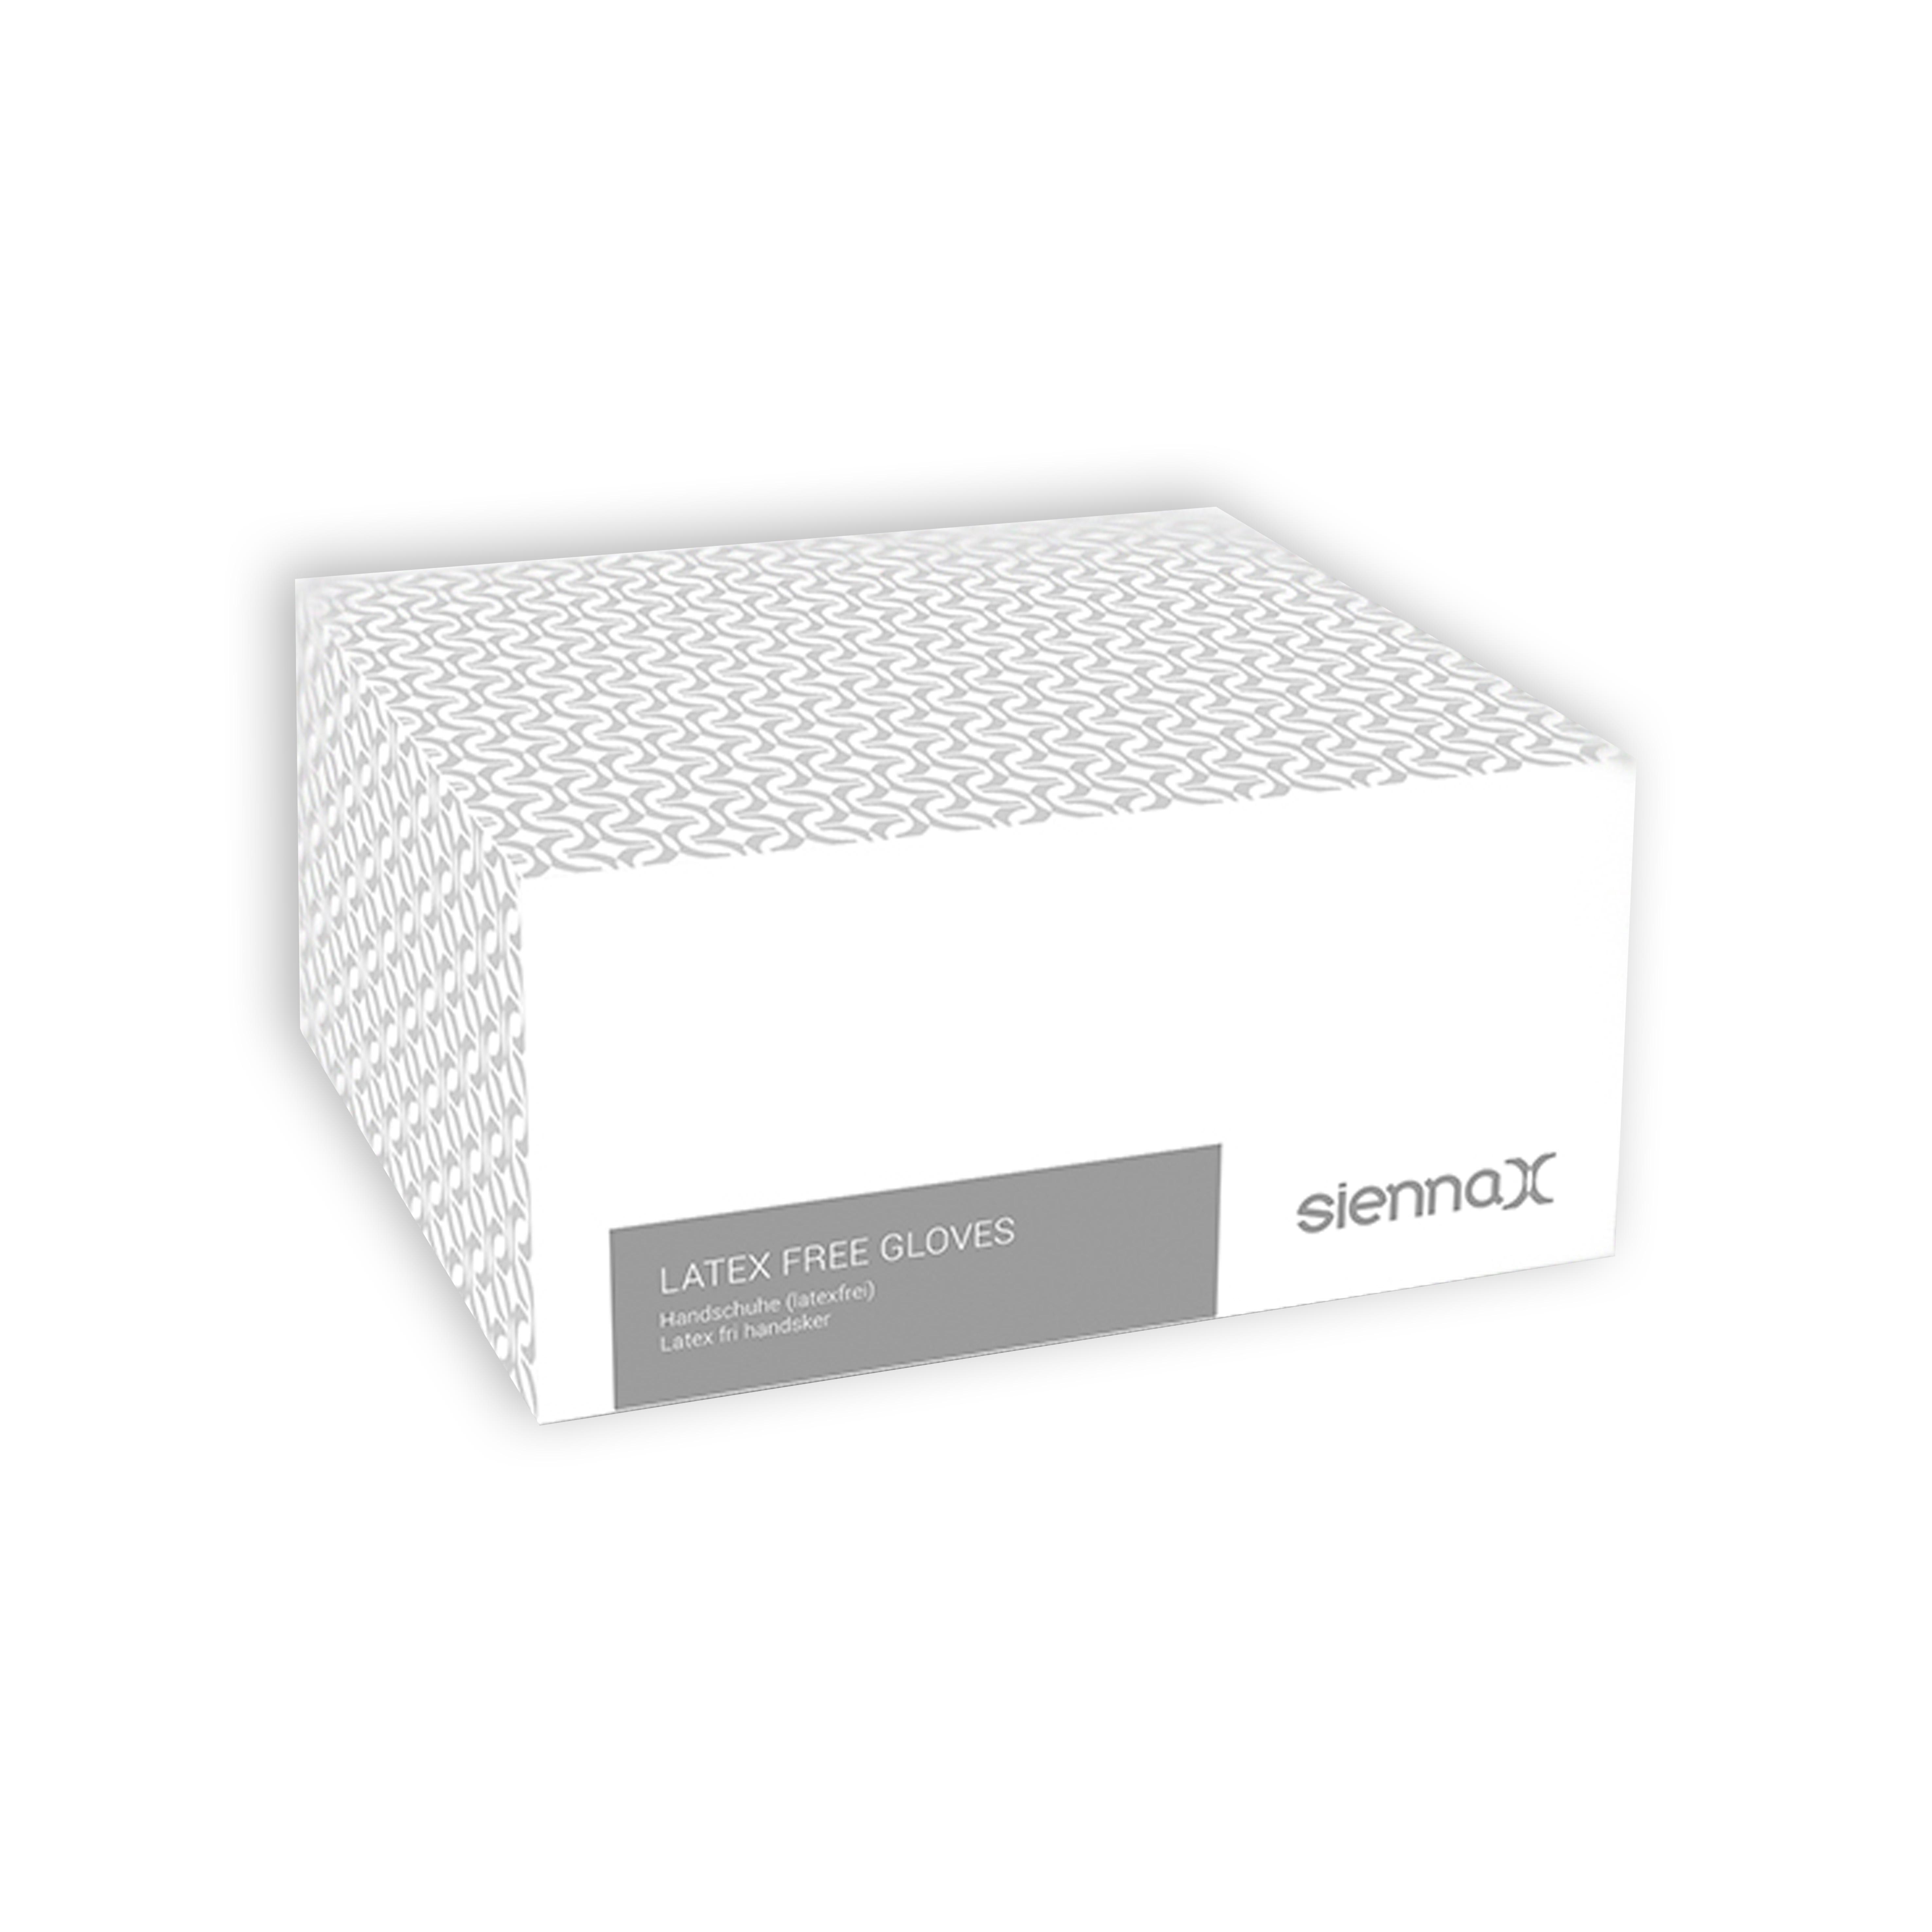 sienna x latex free gloves x50